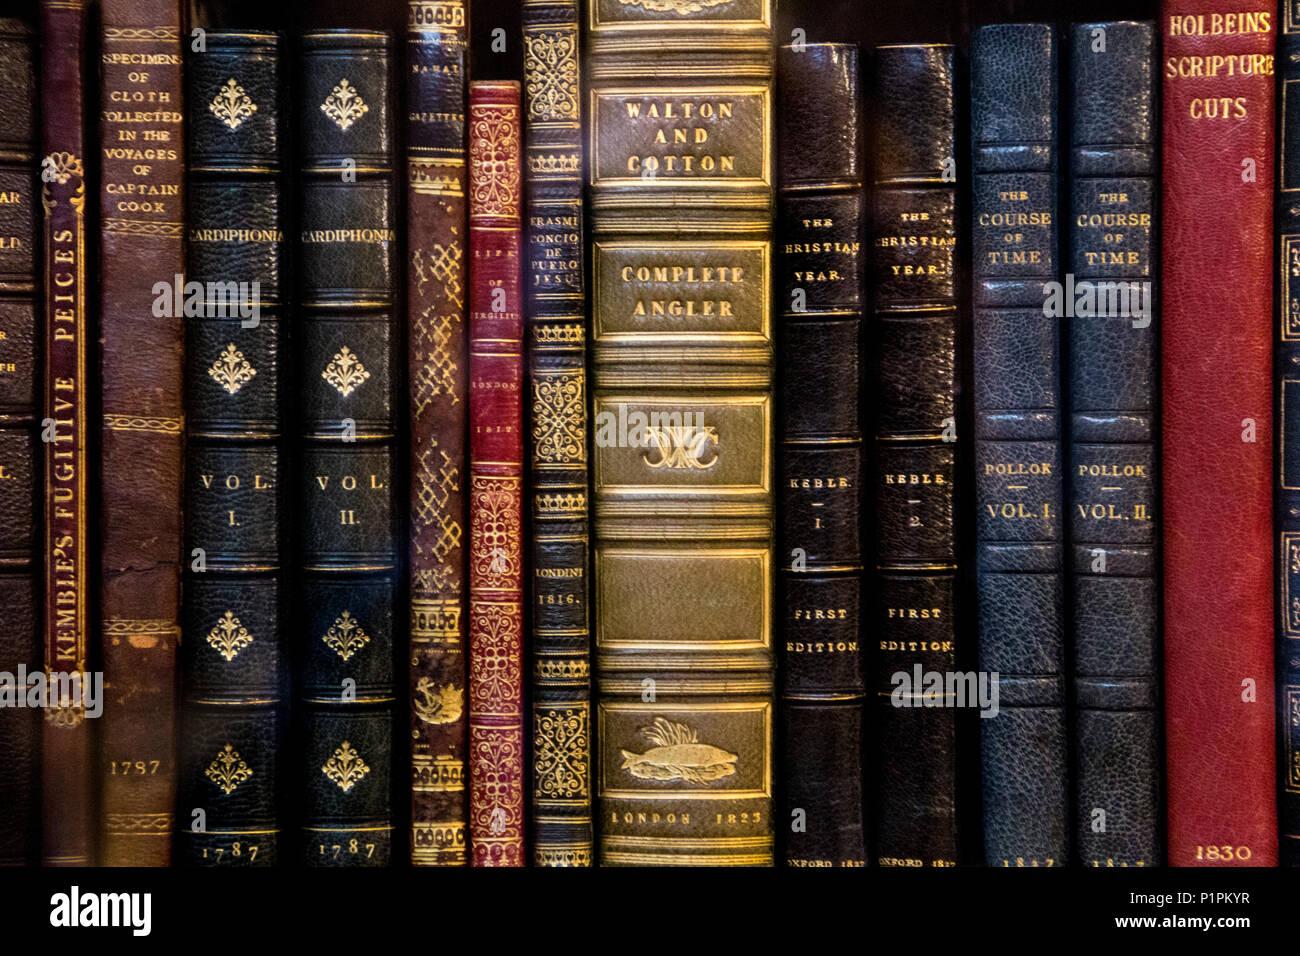 Spines of old hardback antique books on a shelf - Stock Image